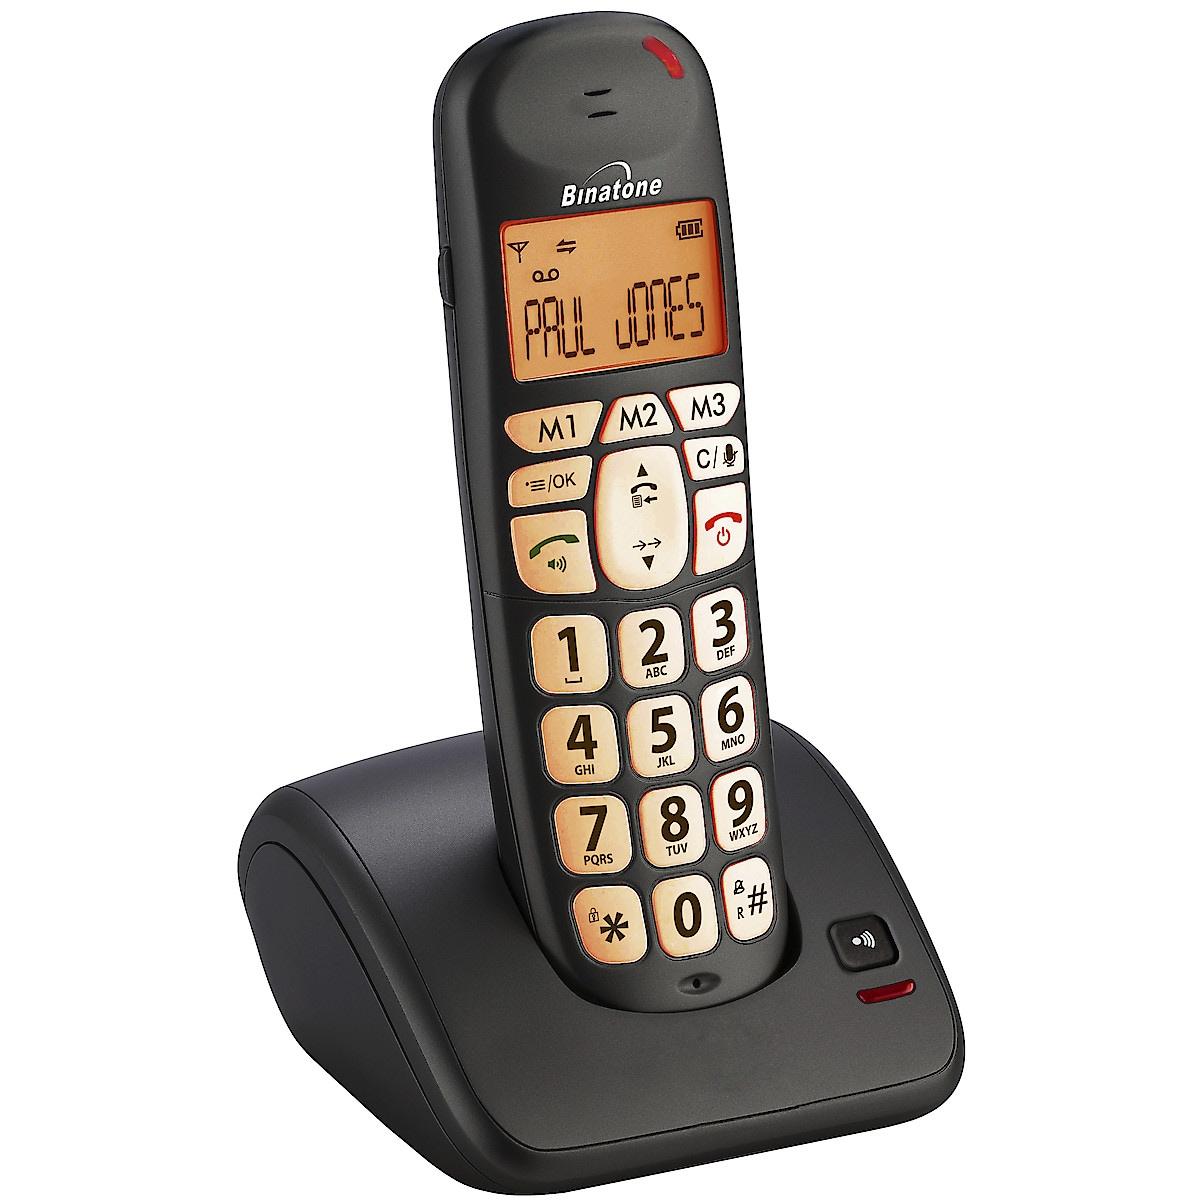 Binatone BB3805 trådløs telefon